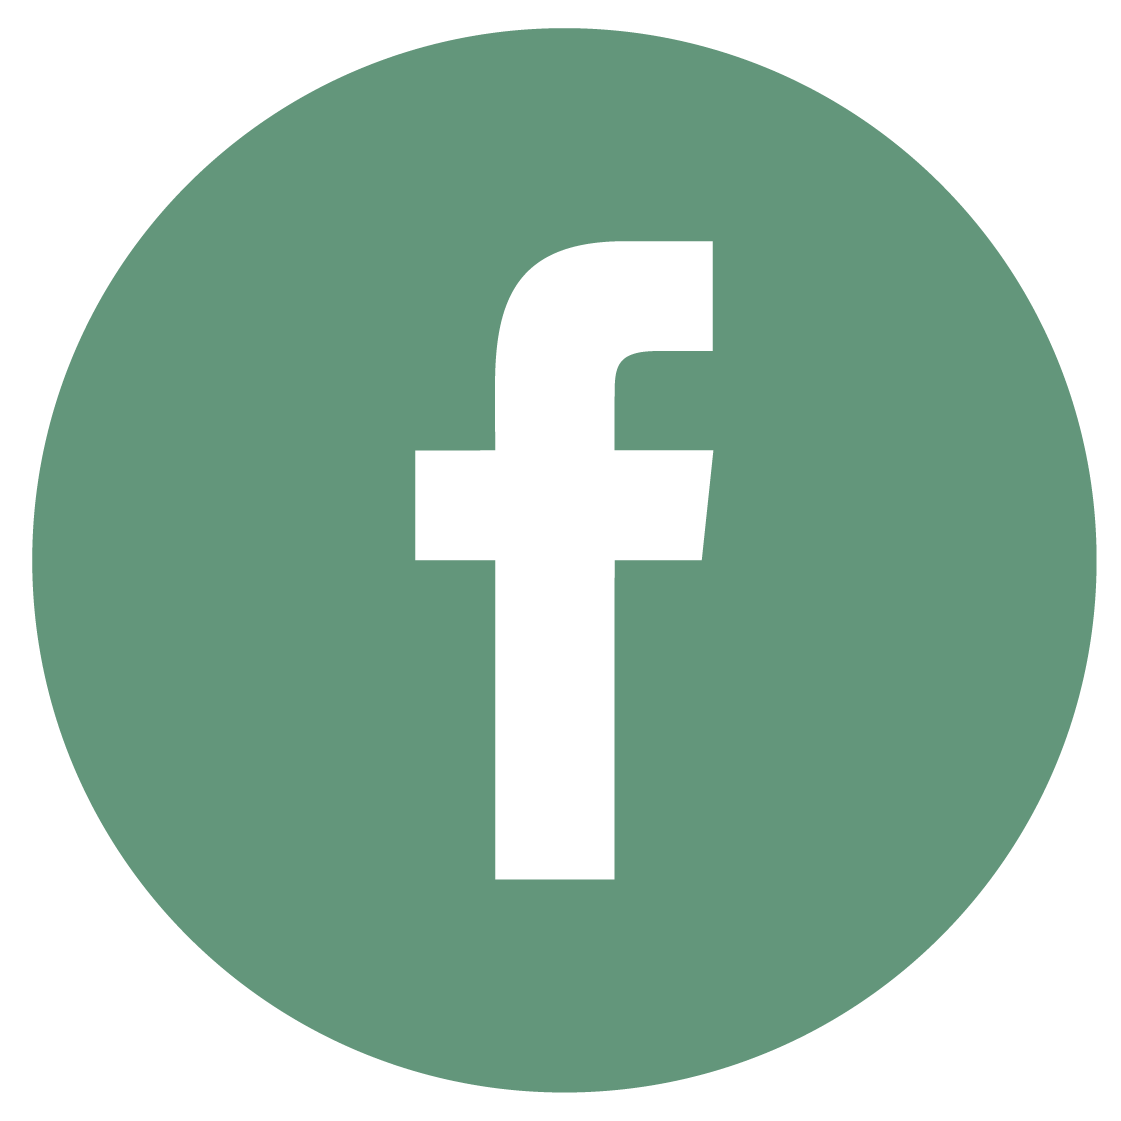 DMC-facebook.png